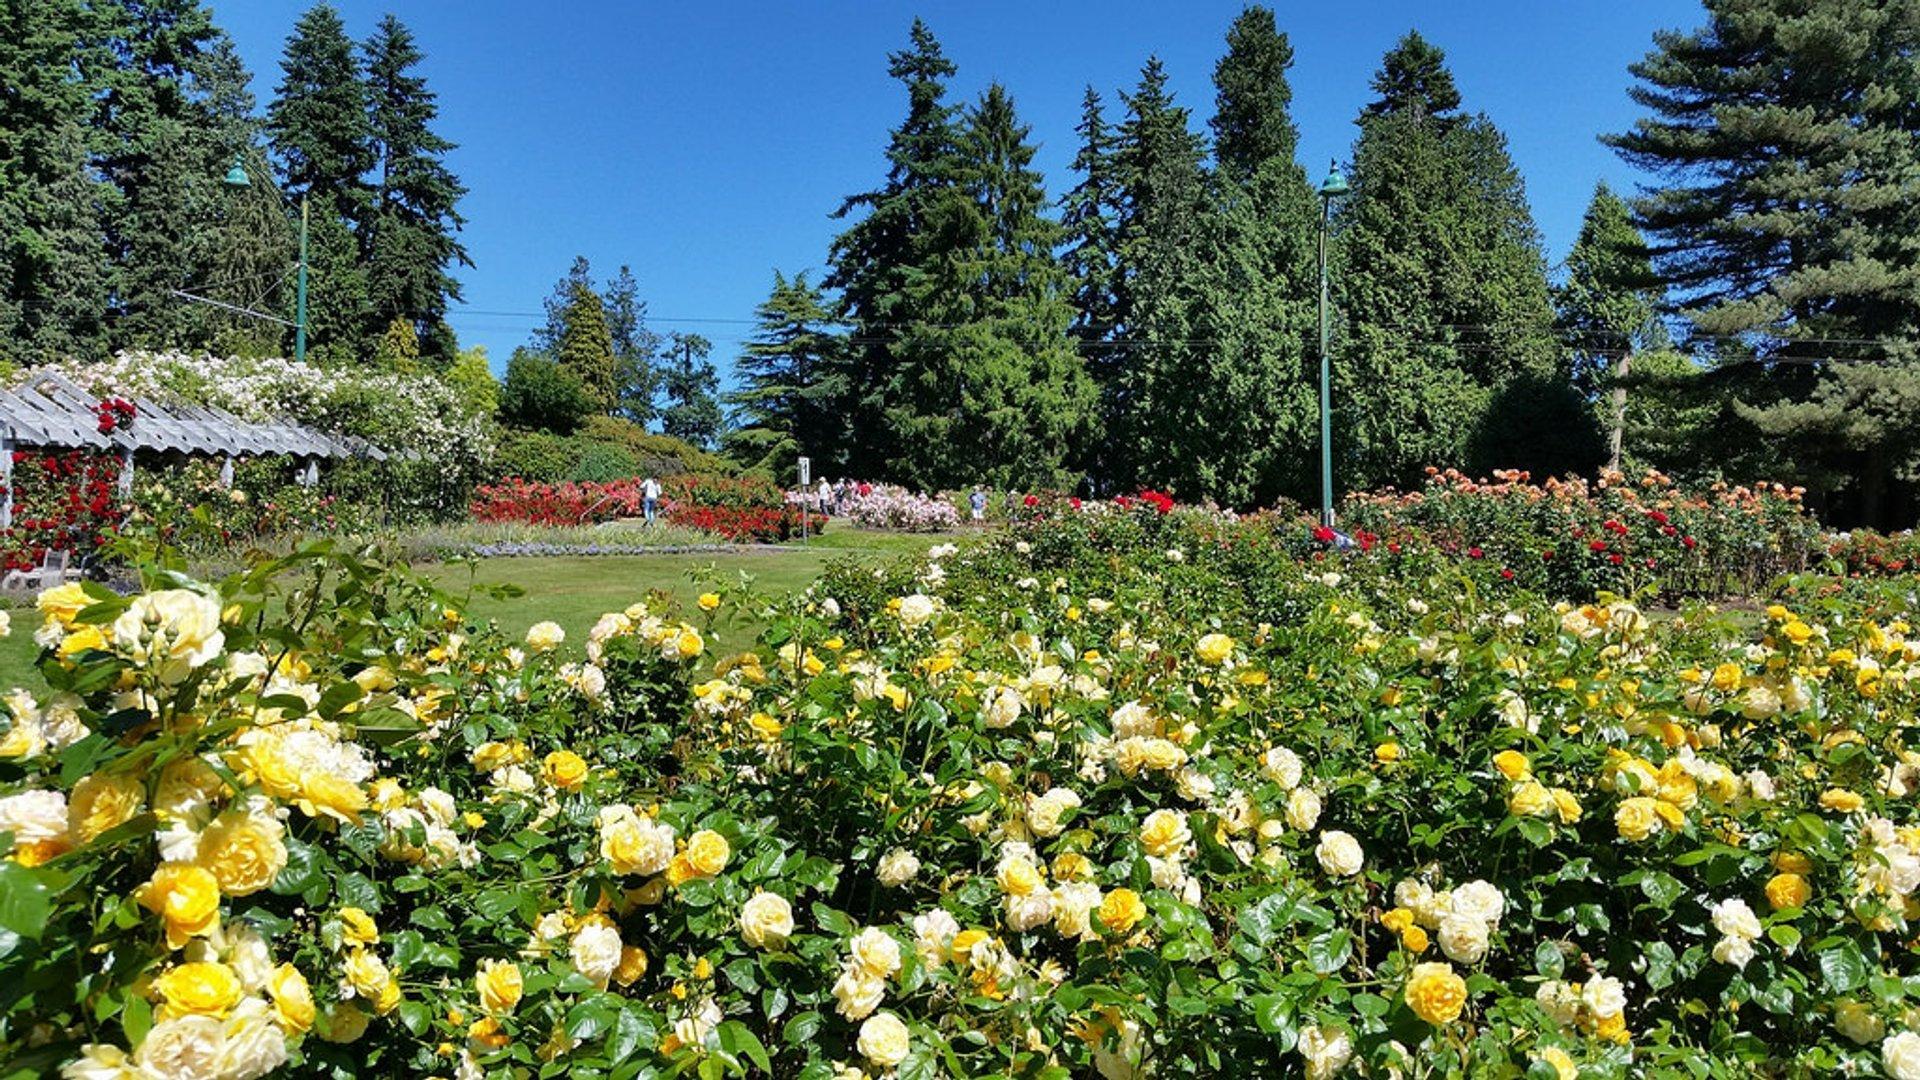 Stanley Park Rose Garden 2020